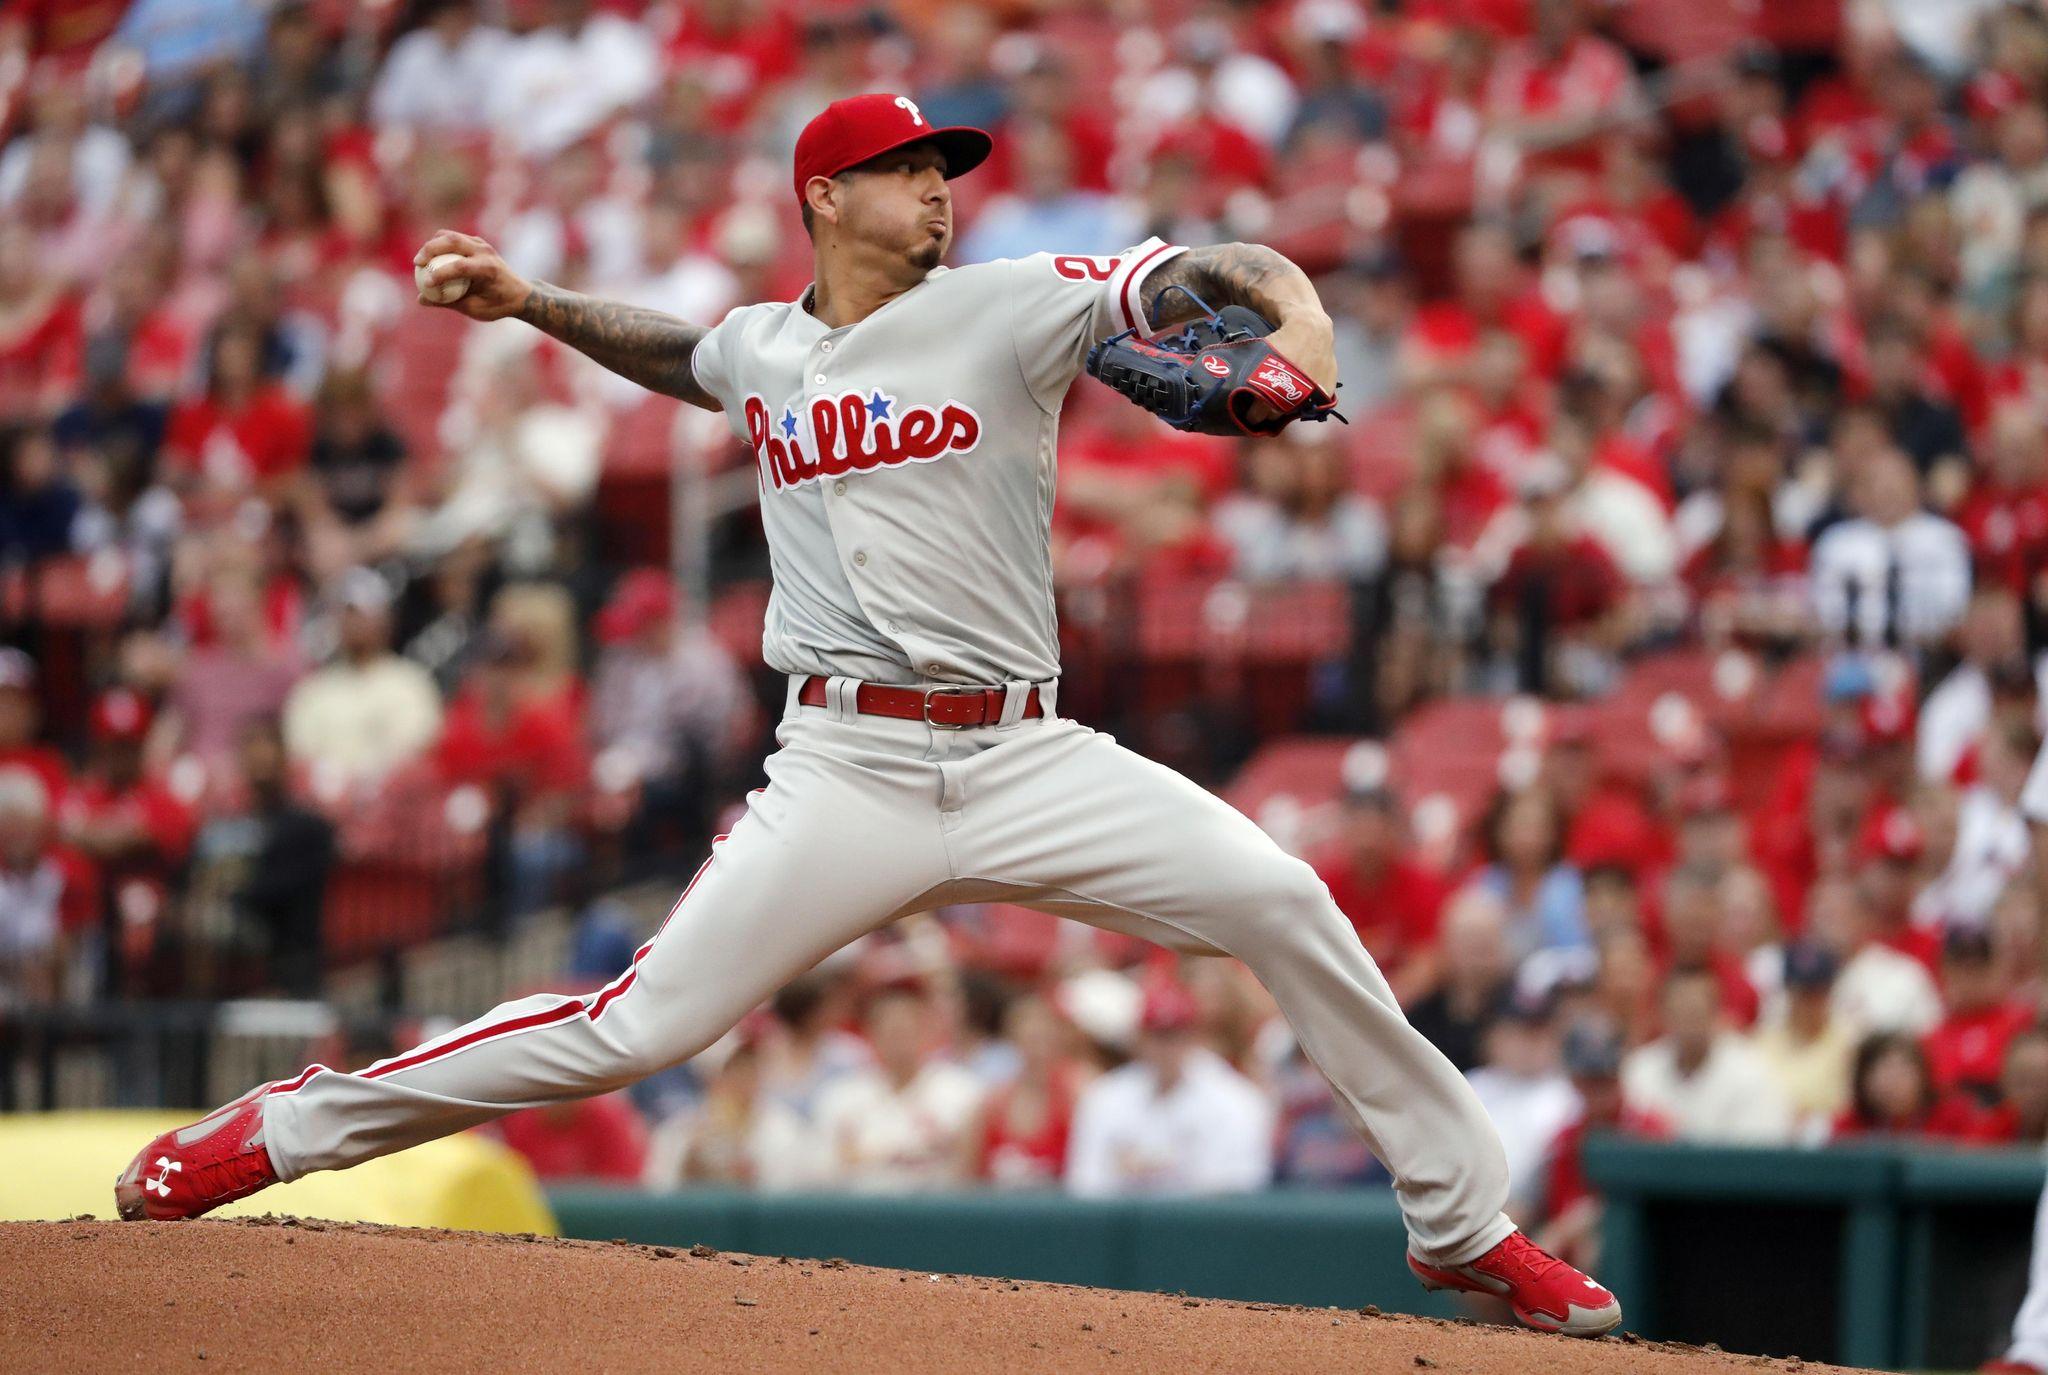 Phillies_cardinals_baseball_46400_s2048x1375